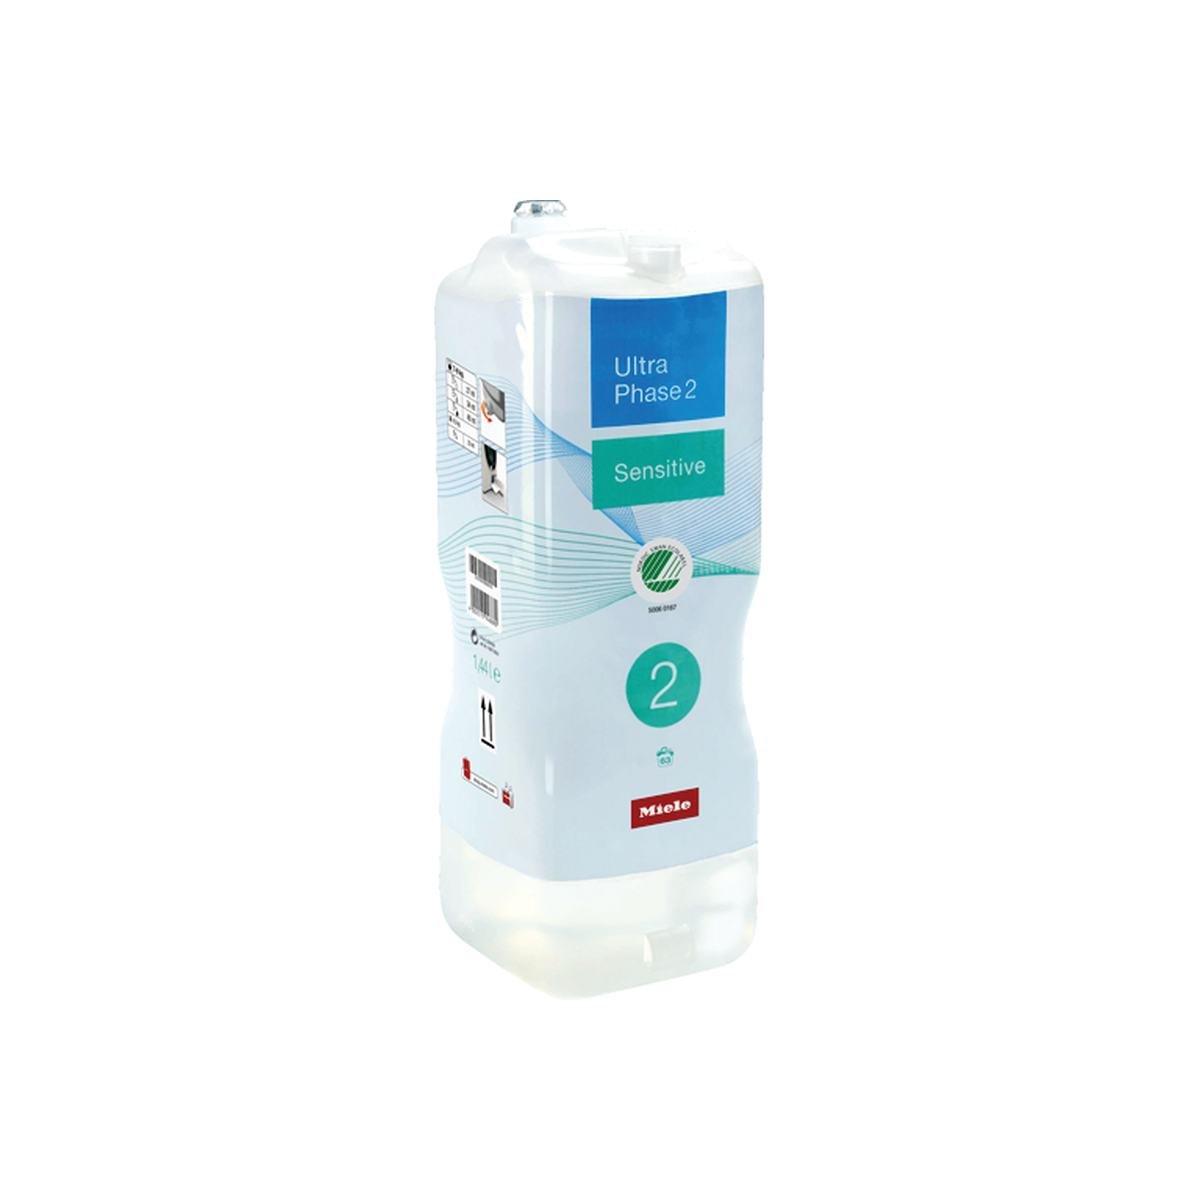 UltraPhase 2 Sensitive WA UPS2 1401 L - Miele